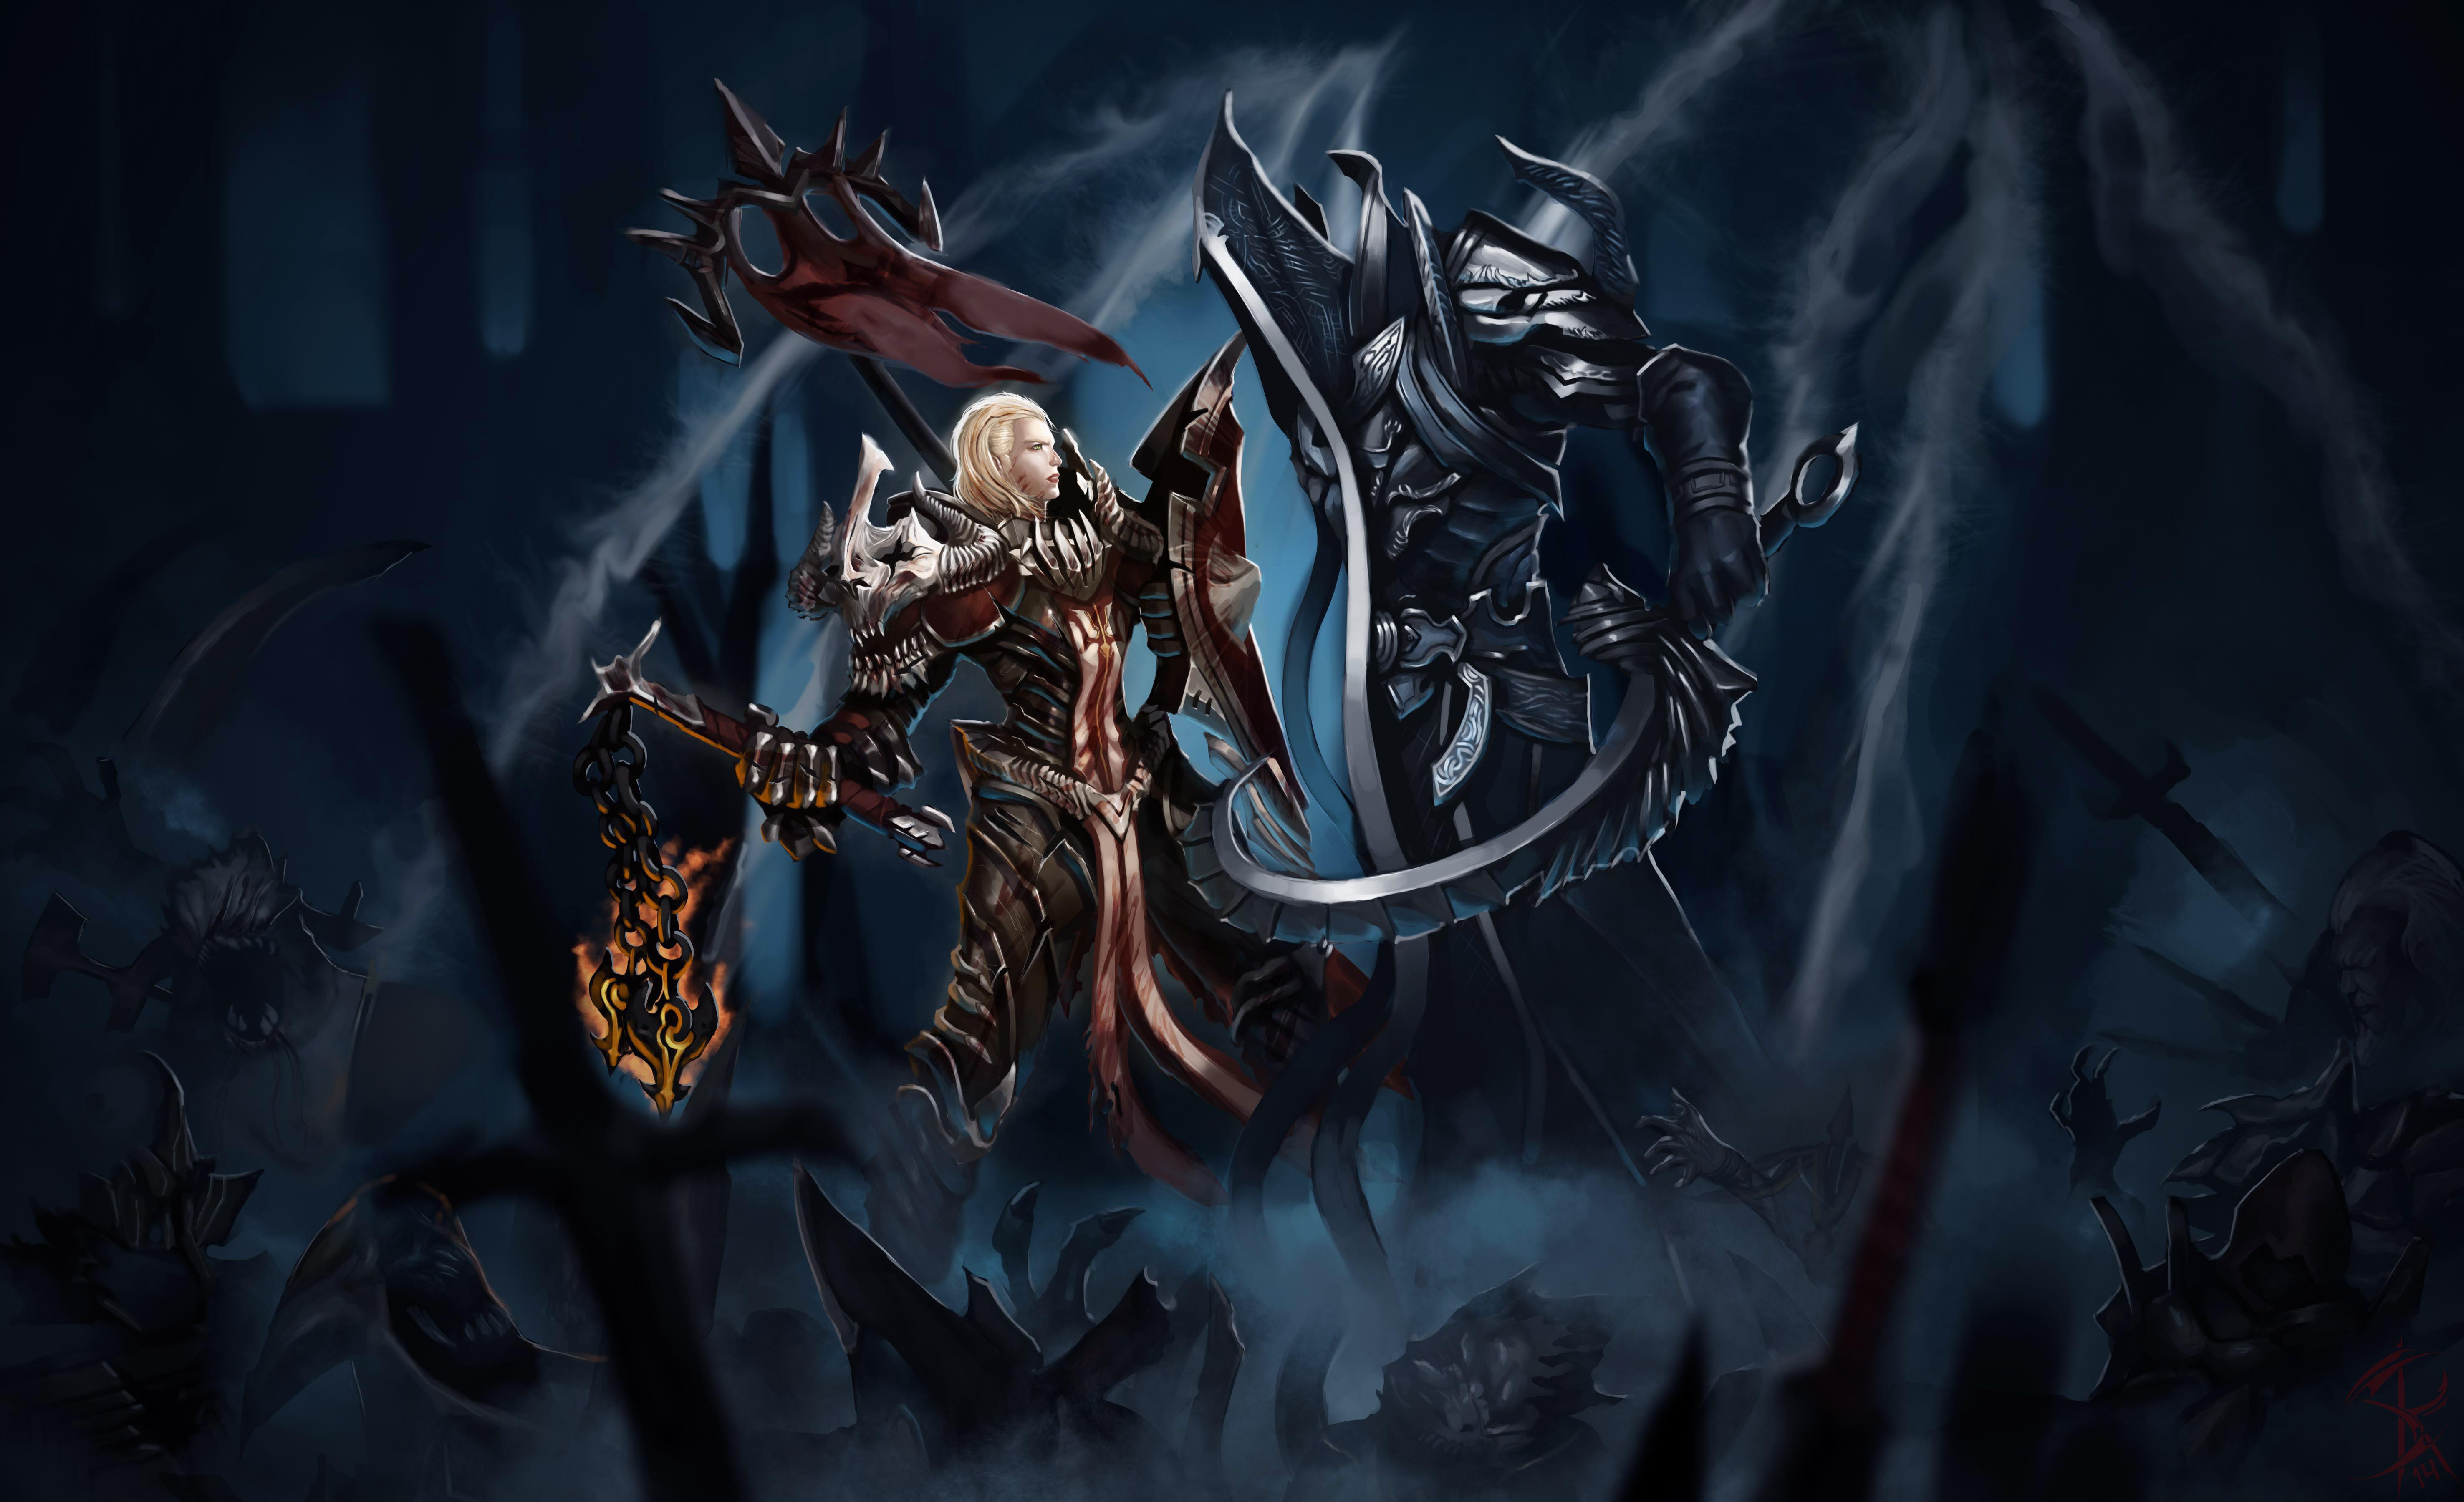 Diablo 3 Ros Wallpaper: Diablo III: Reaper Of Souls 5k Retina Ultra HD Wallpaper